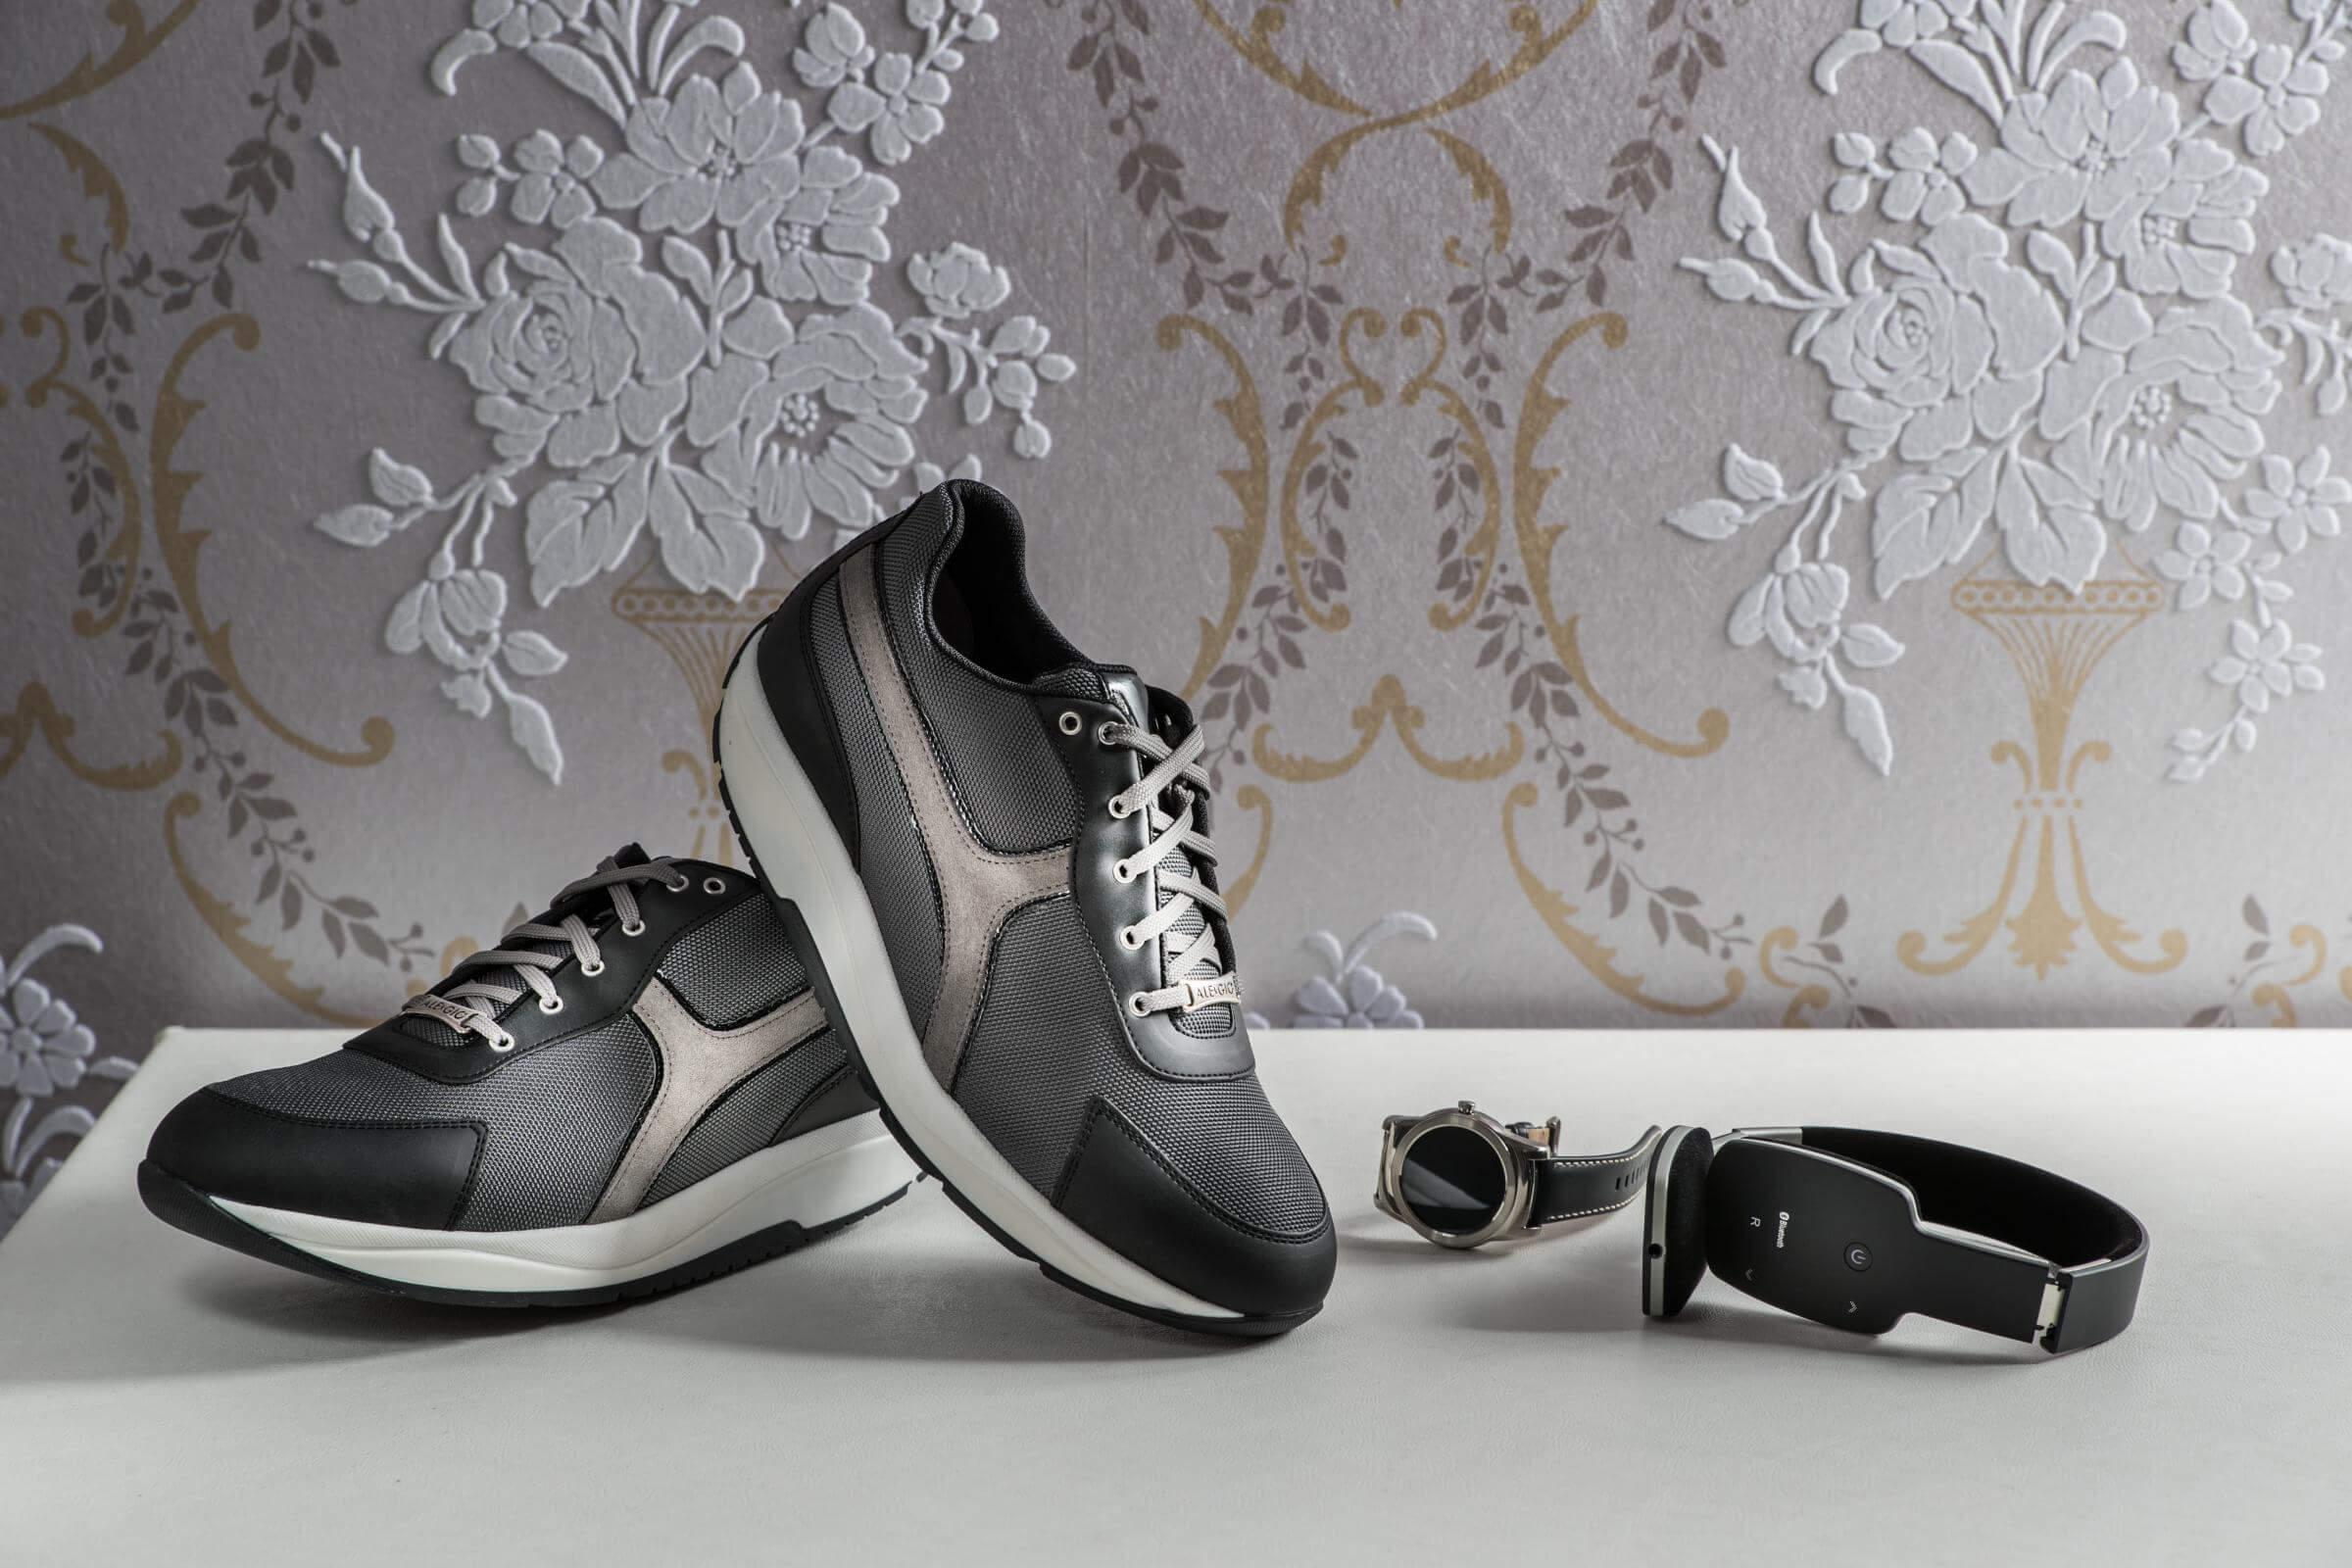 scarpe-inverno-2017-2.jpg